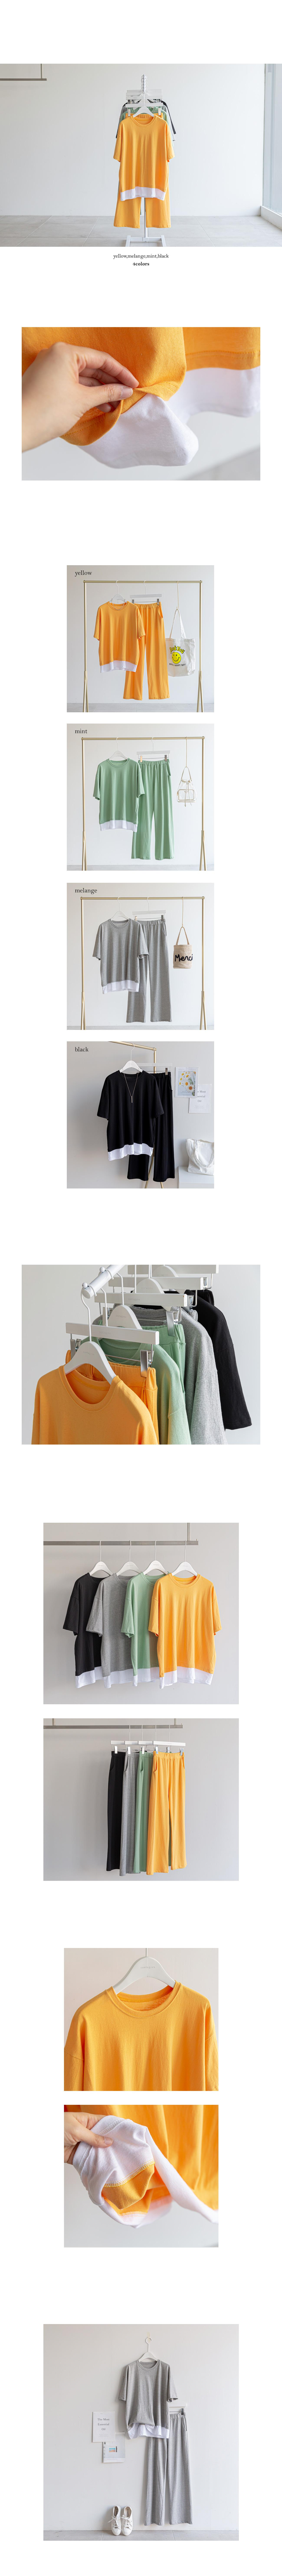 Color Matching Layered Training Set #94035